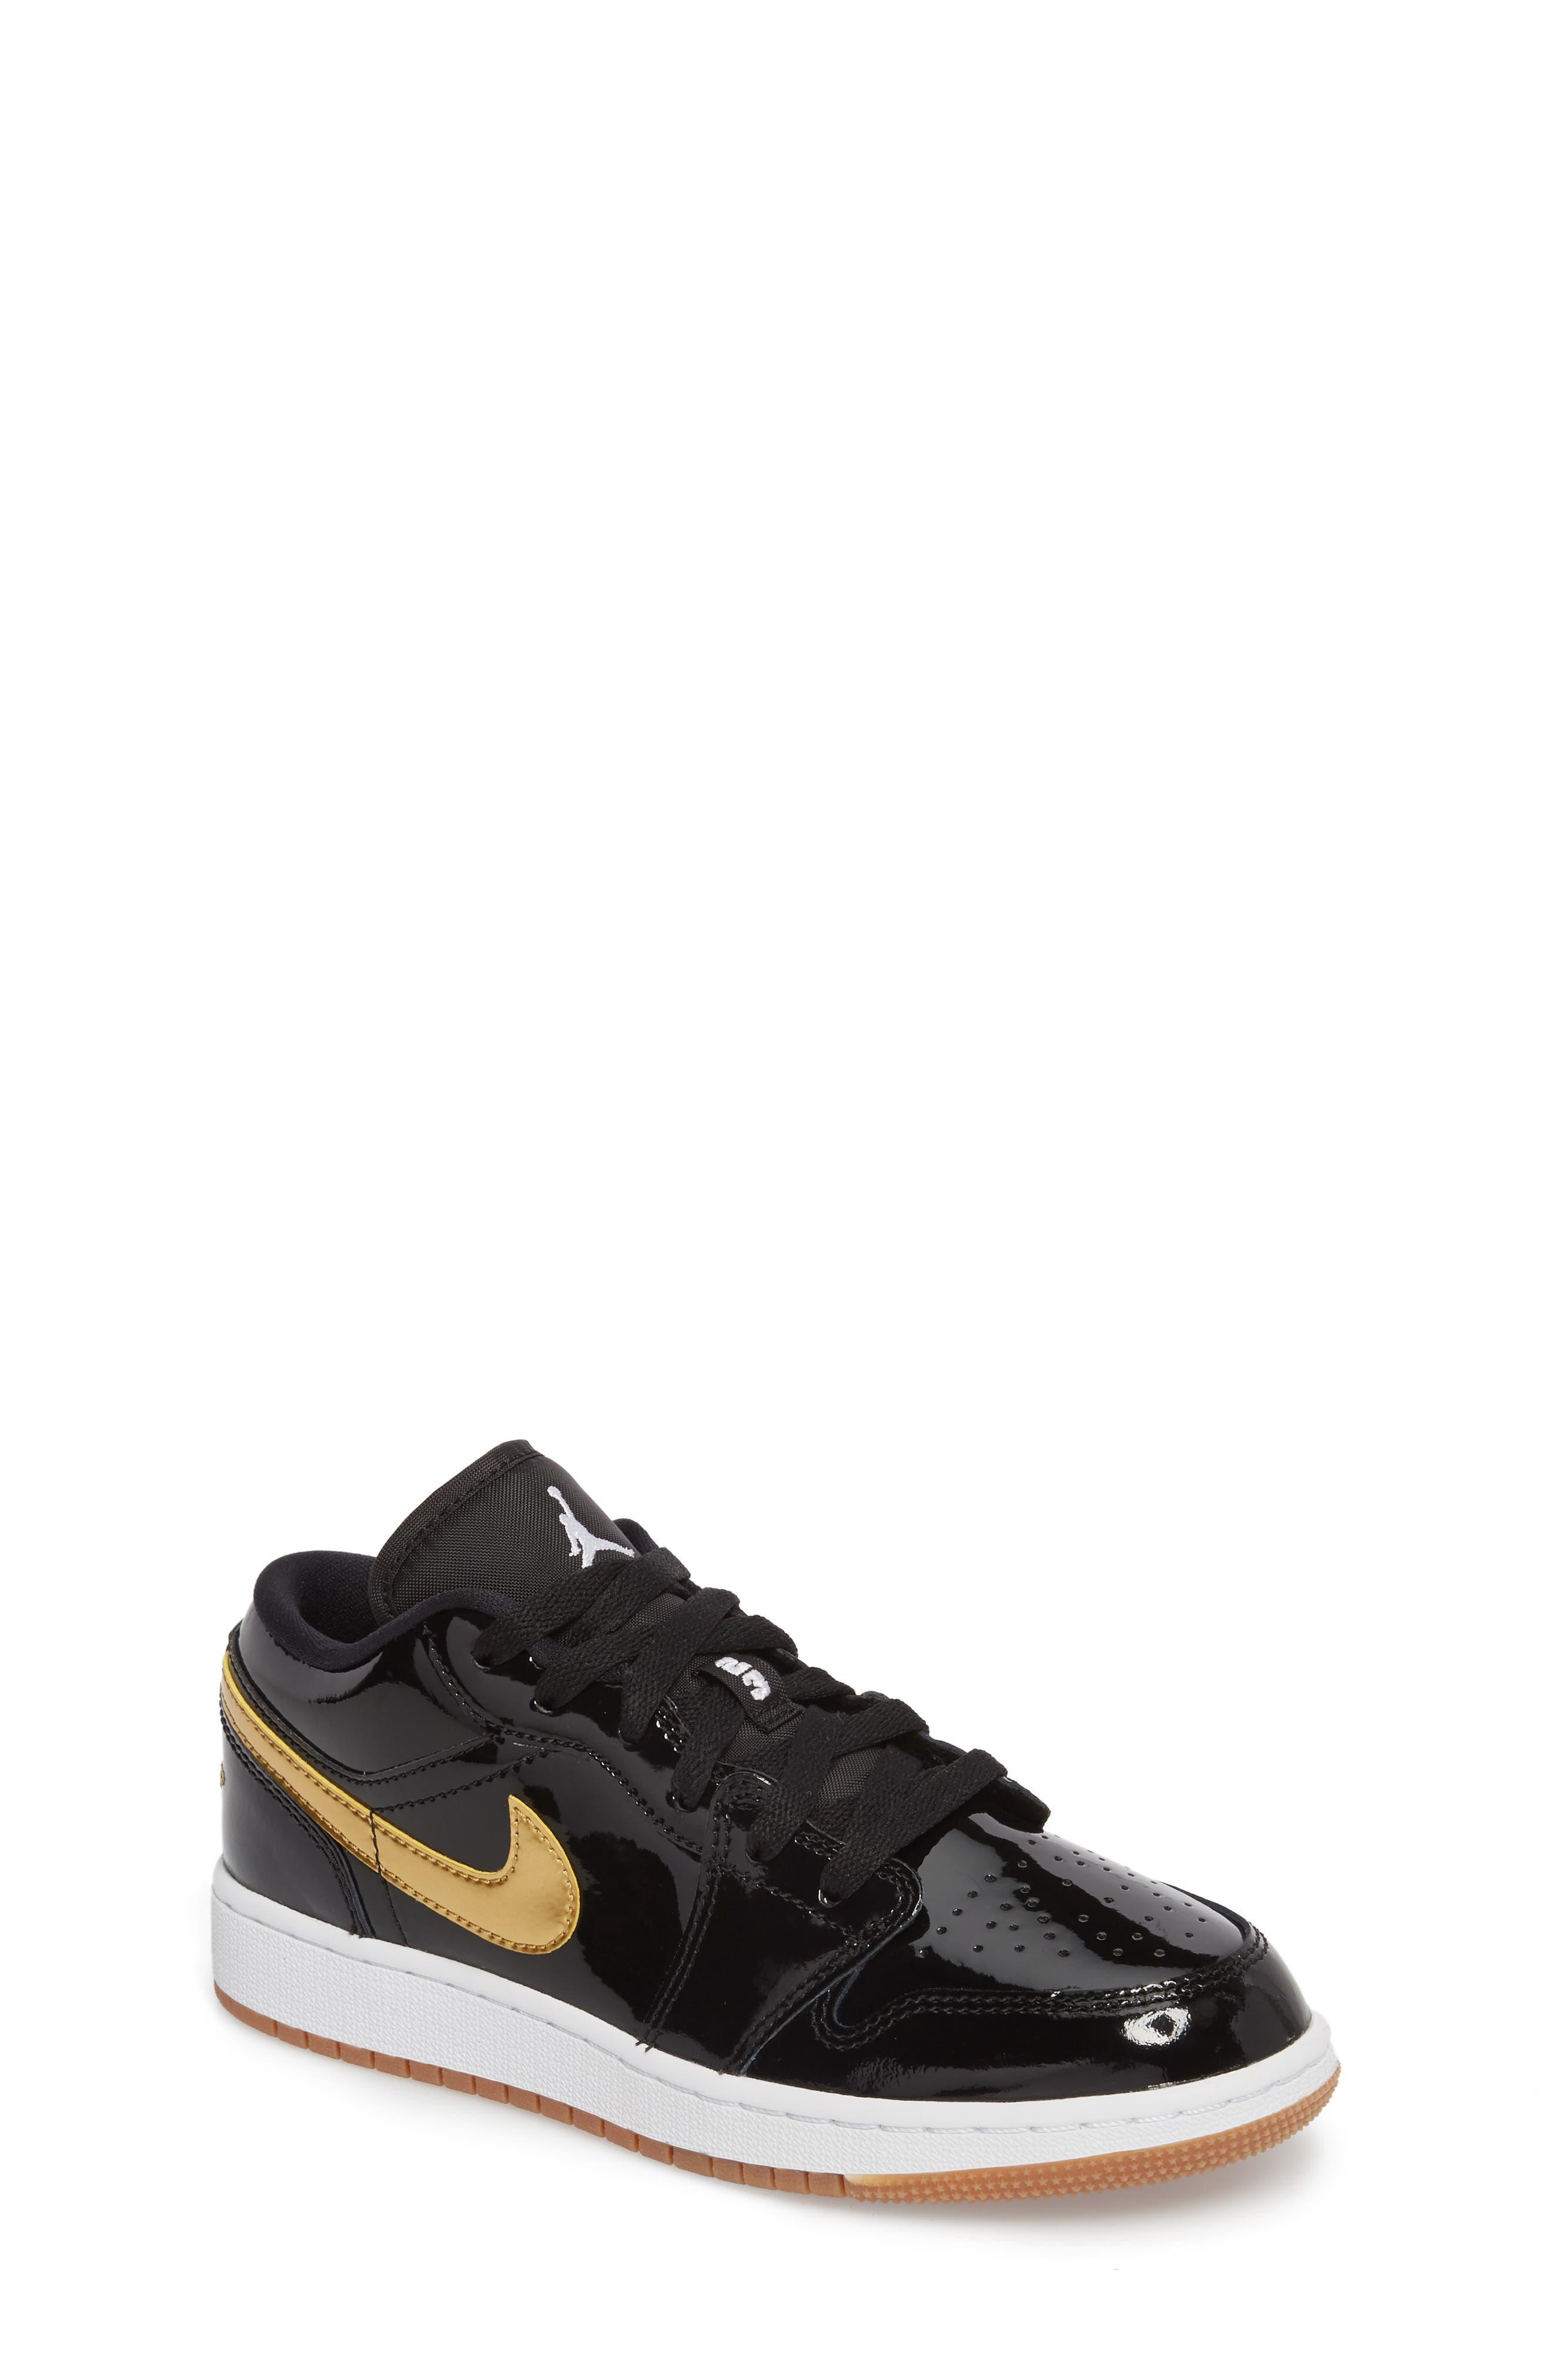 Nike 'Jordan 1 Low' Basketball Shoe,                         Main,                         color, Black/ Metallic Gold/ White